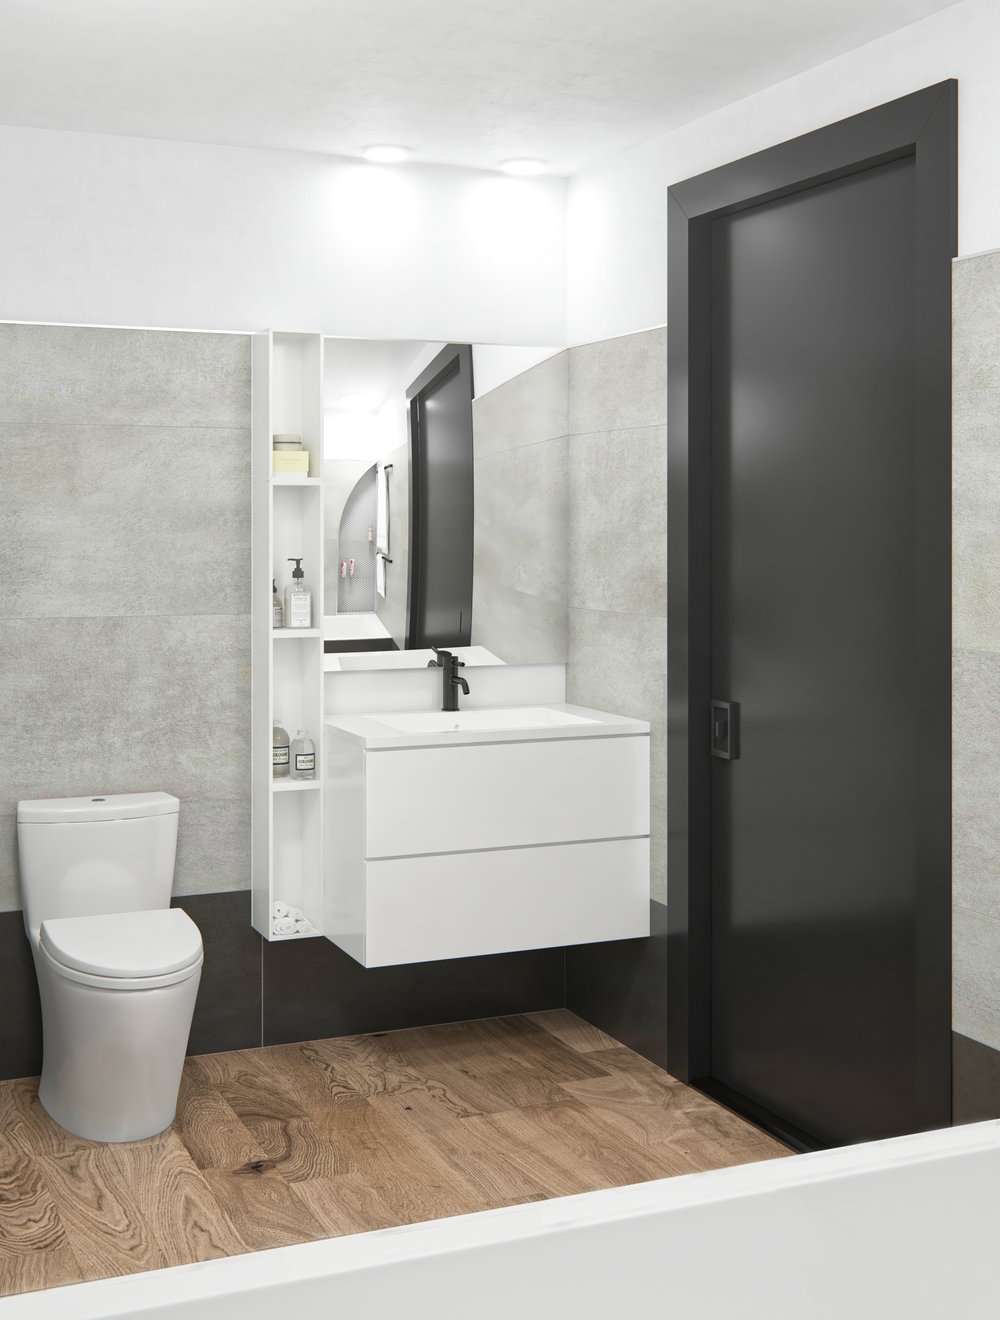 380 MONTGOMERY BATHROOM 1.jpg